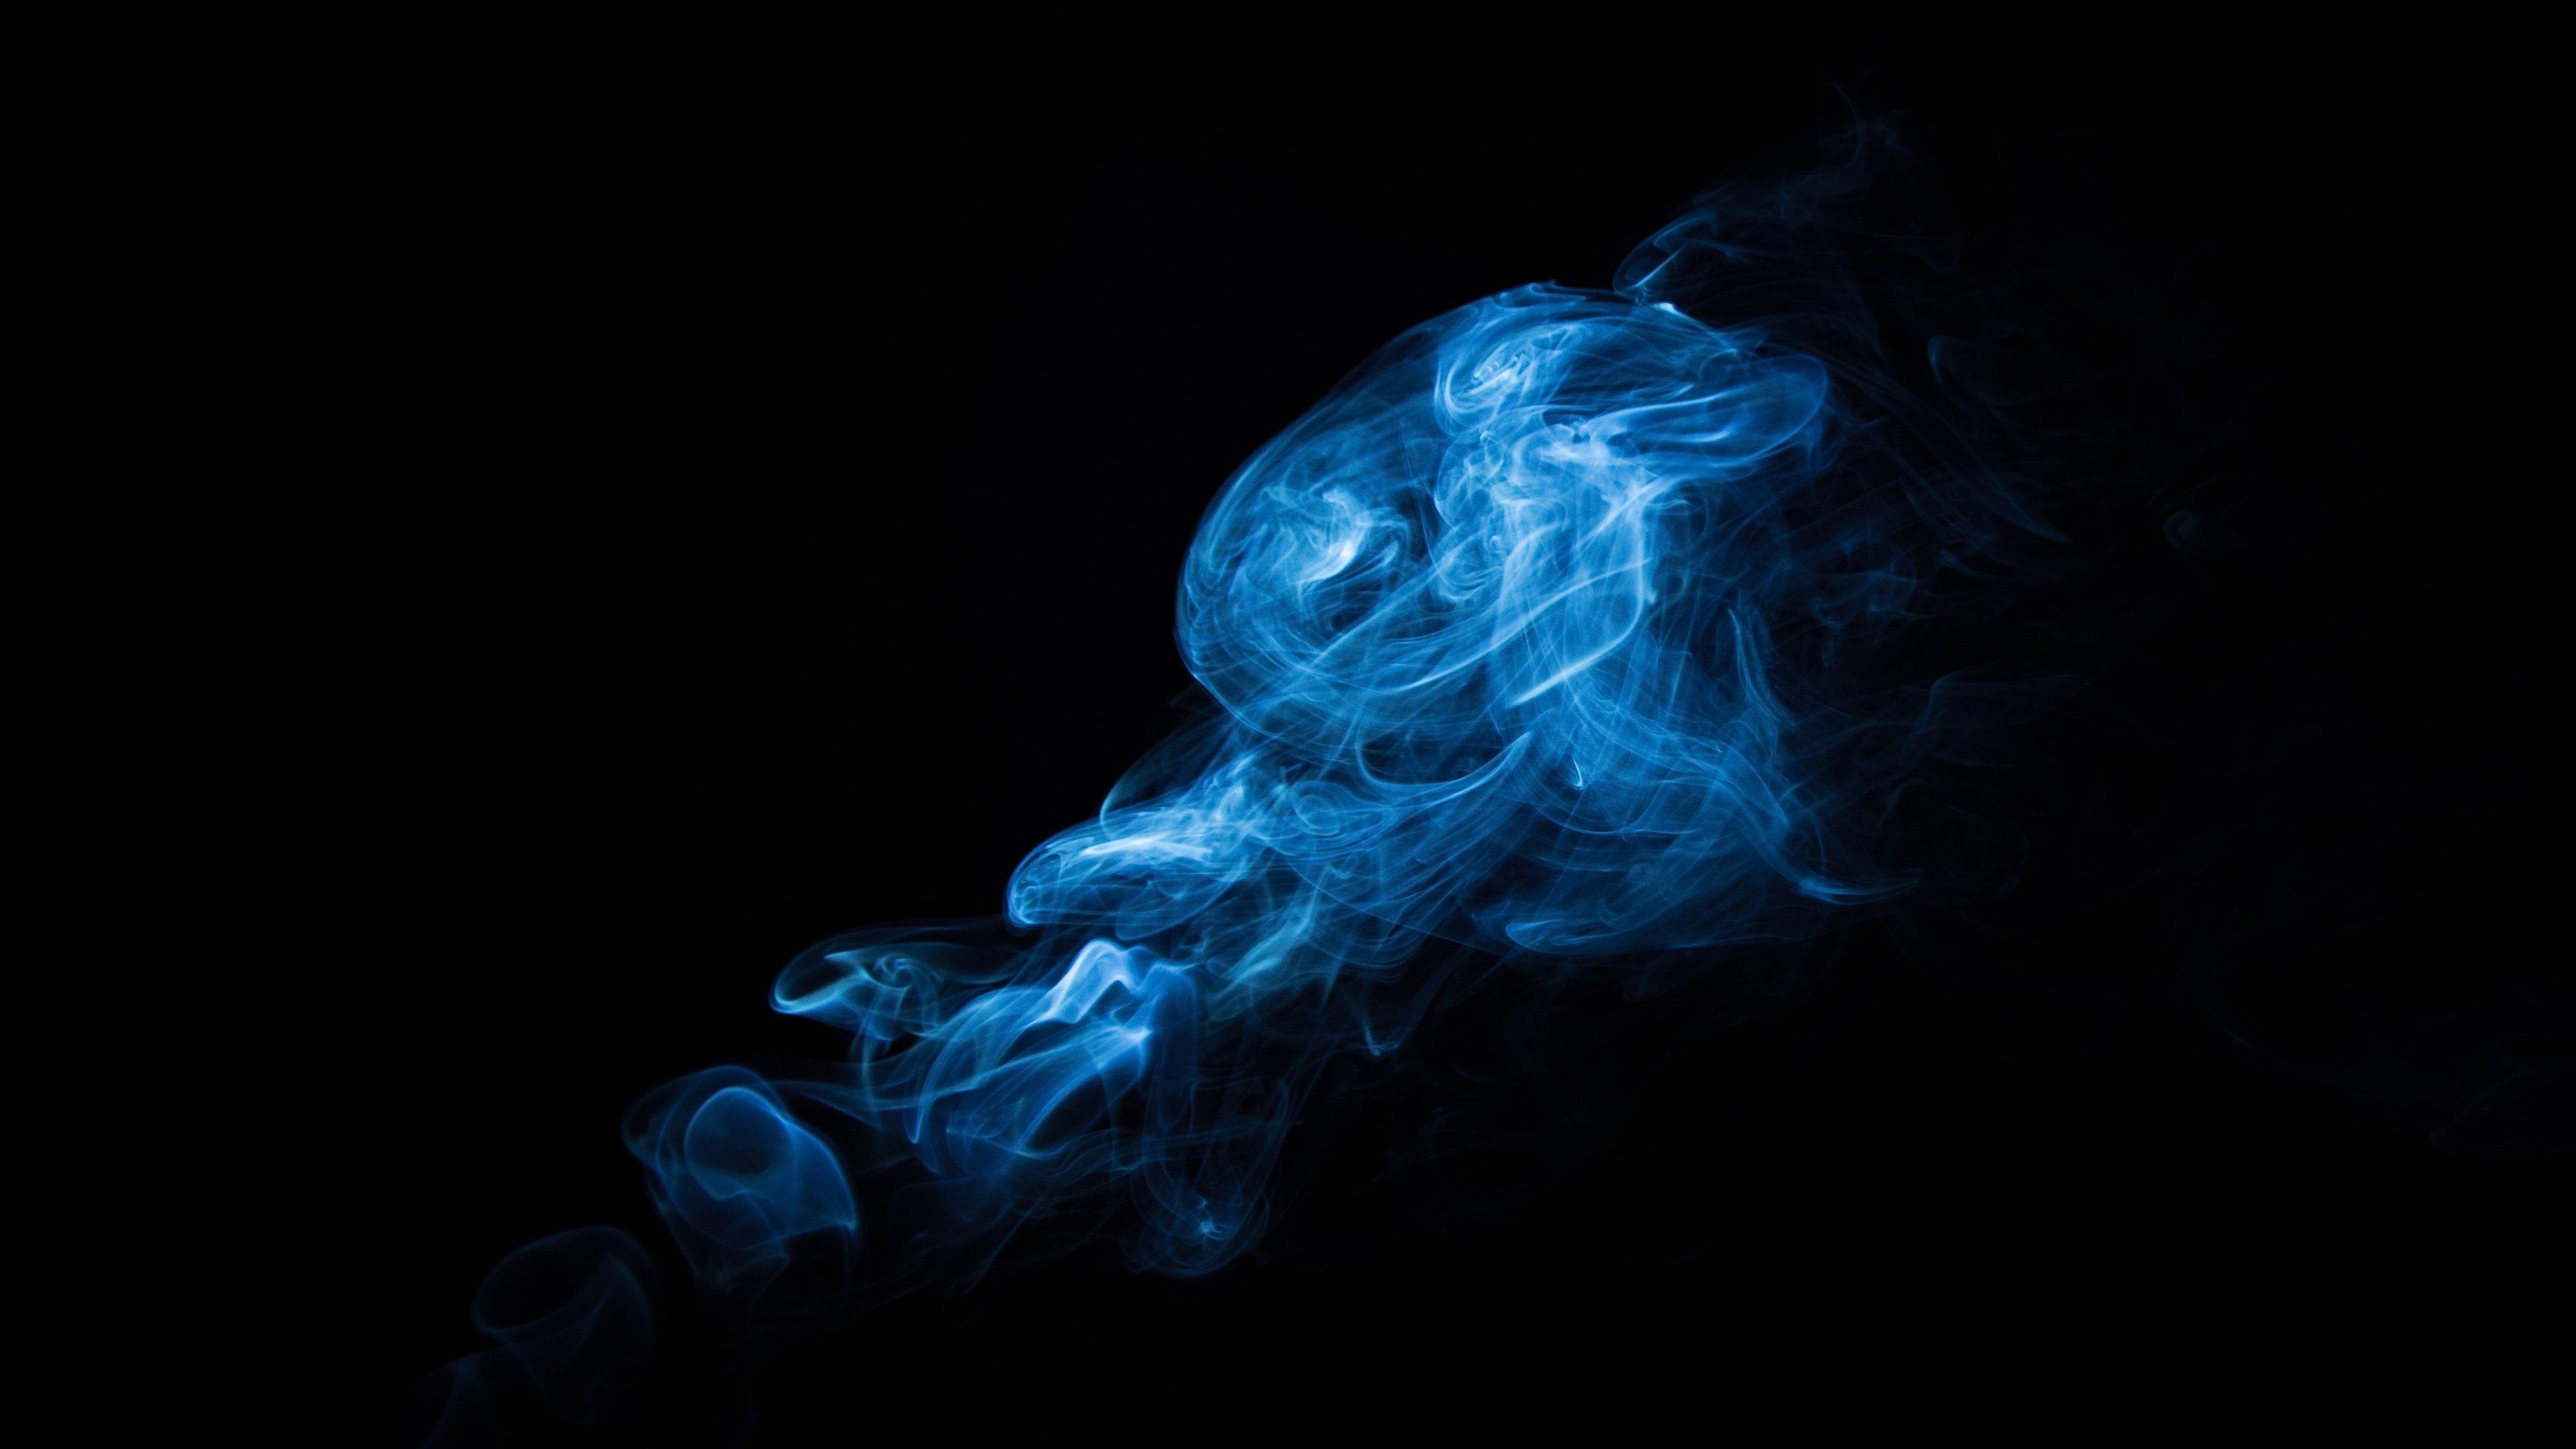 Blue Smoke Wallpaper Mobile Desktop Background